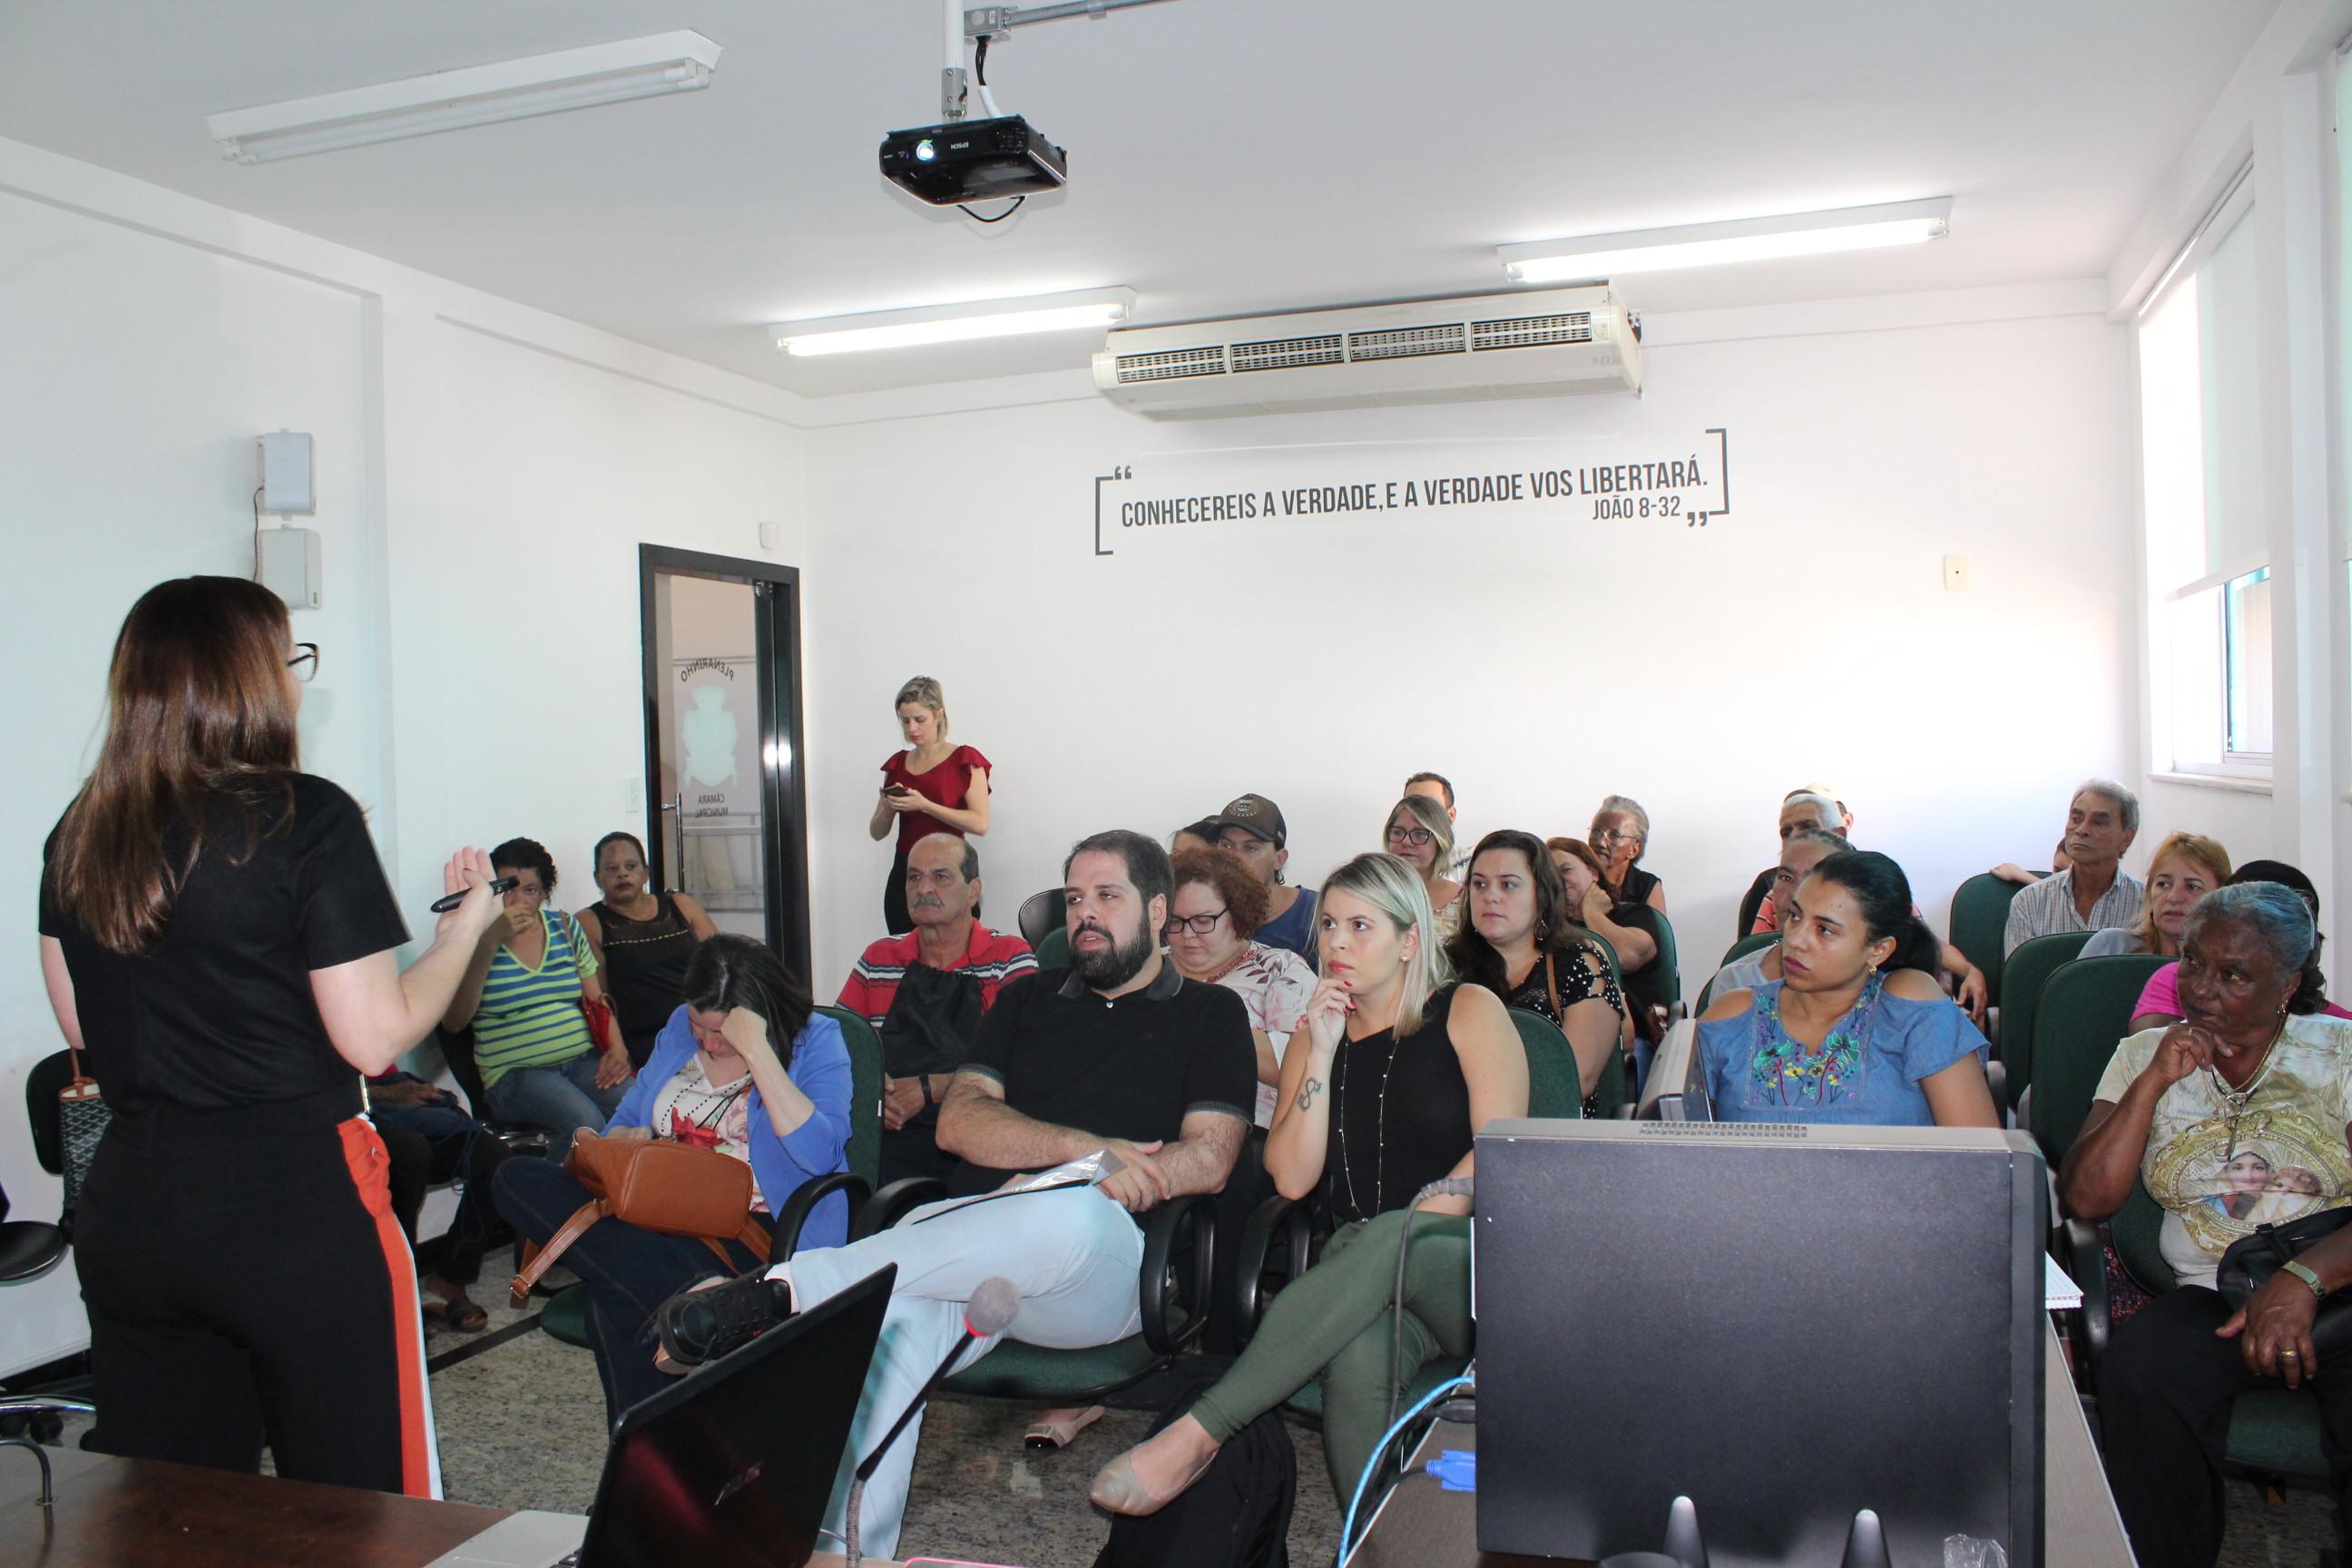 Prefeitura Intensifica Programa Contra O Tabagismo O Popular